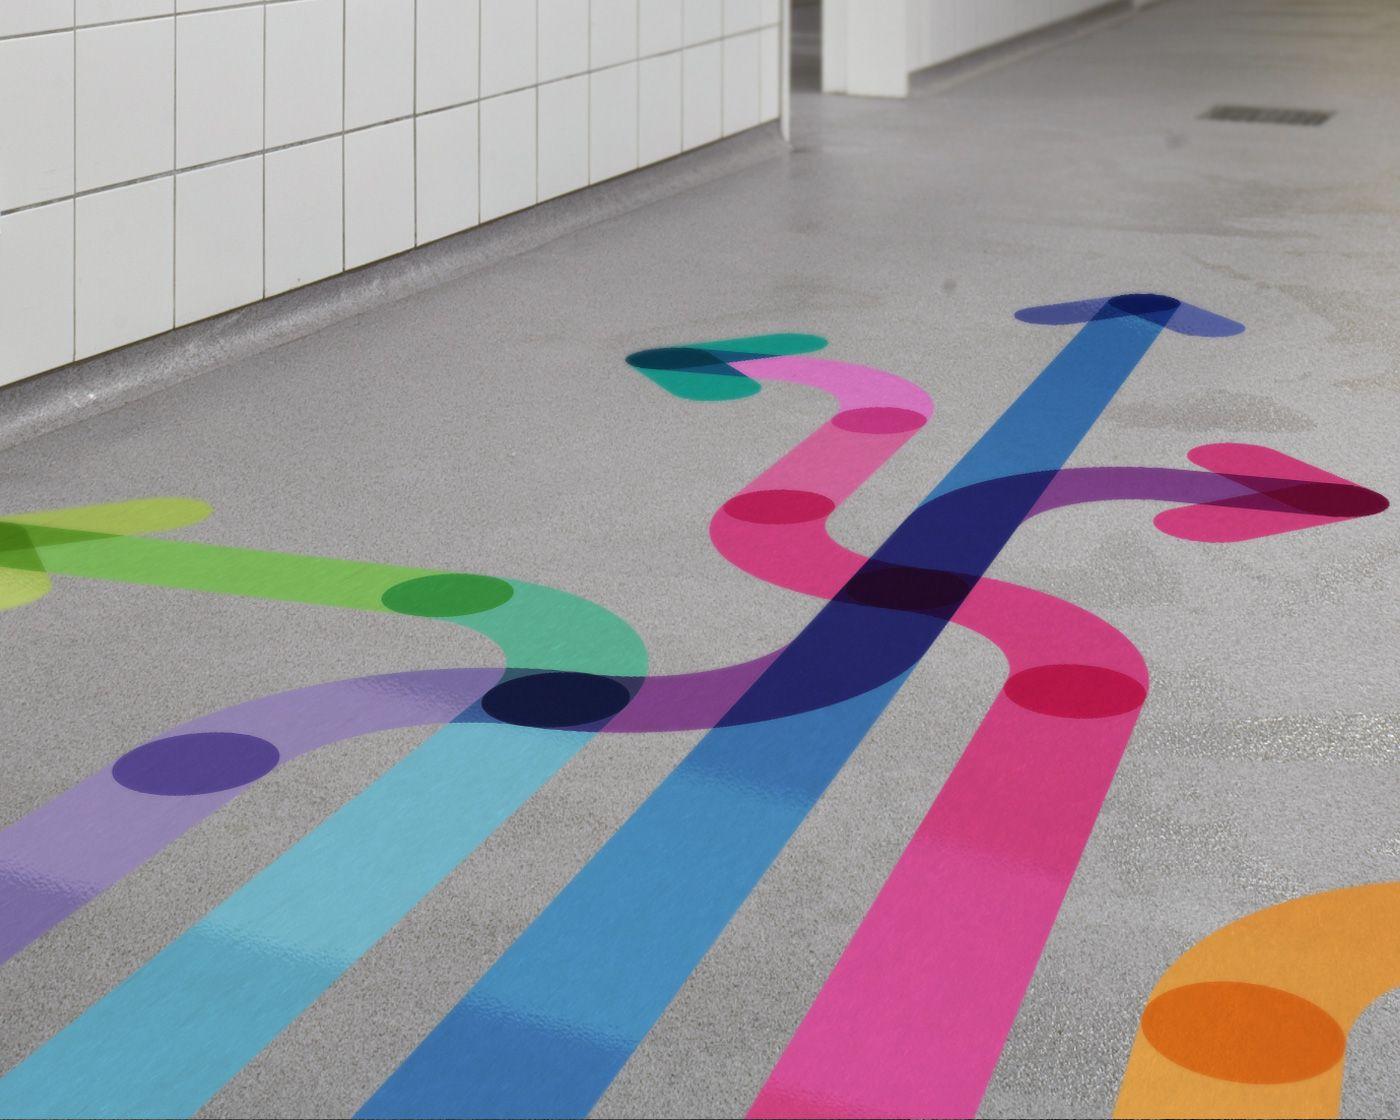 Floor Sticker Printing Retail Branding Amp Way Finding